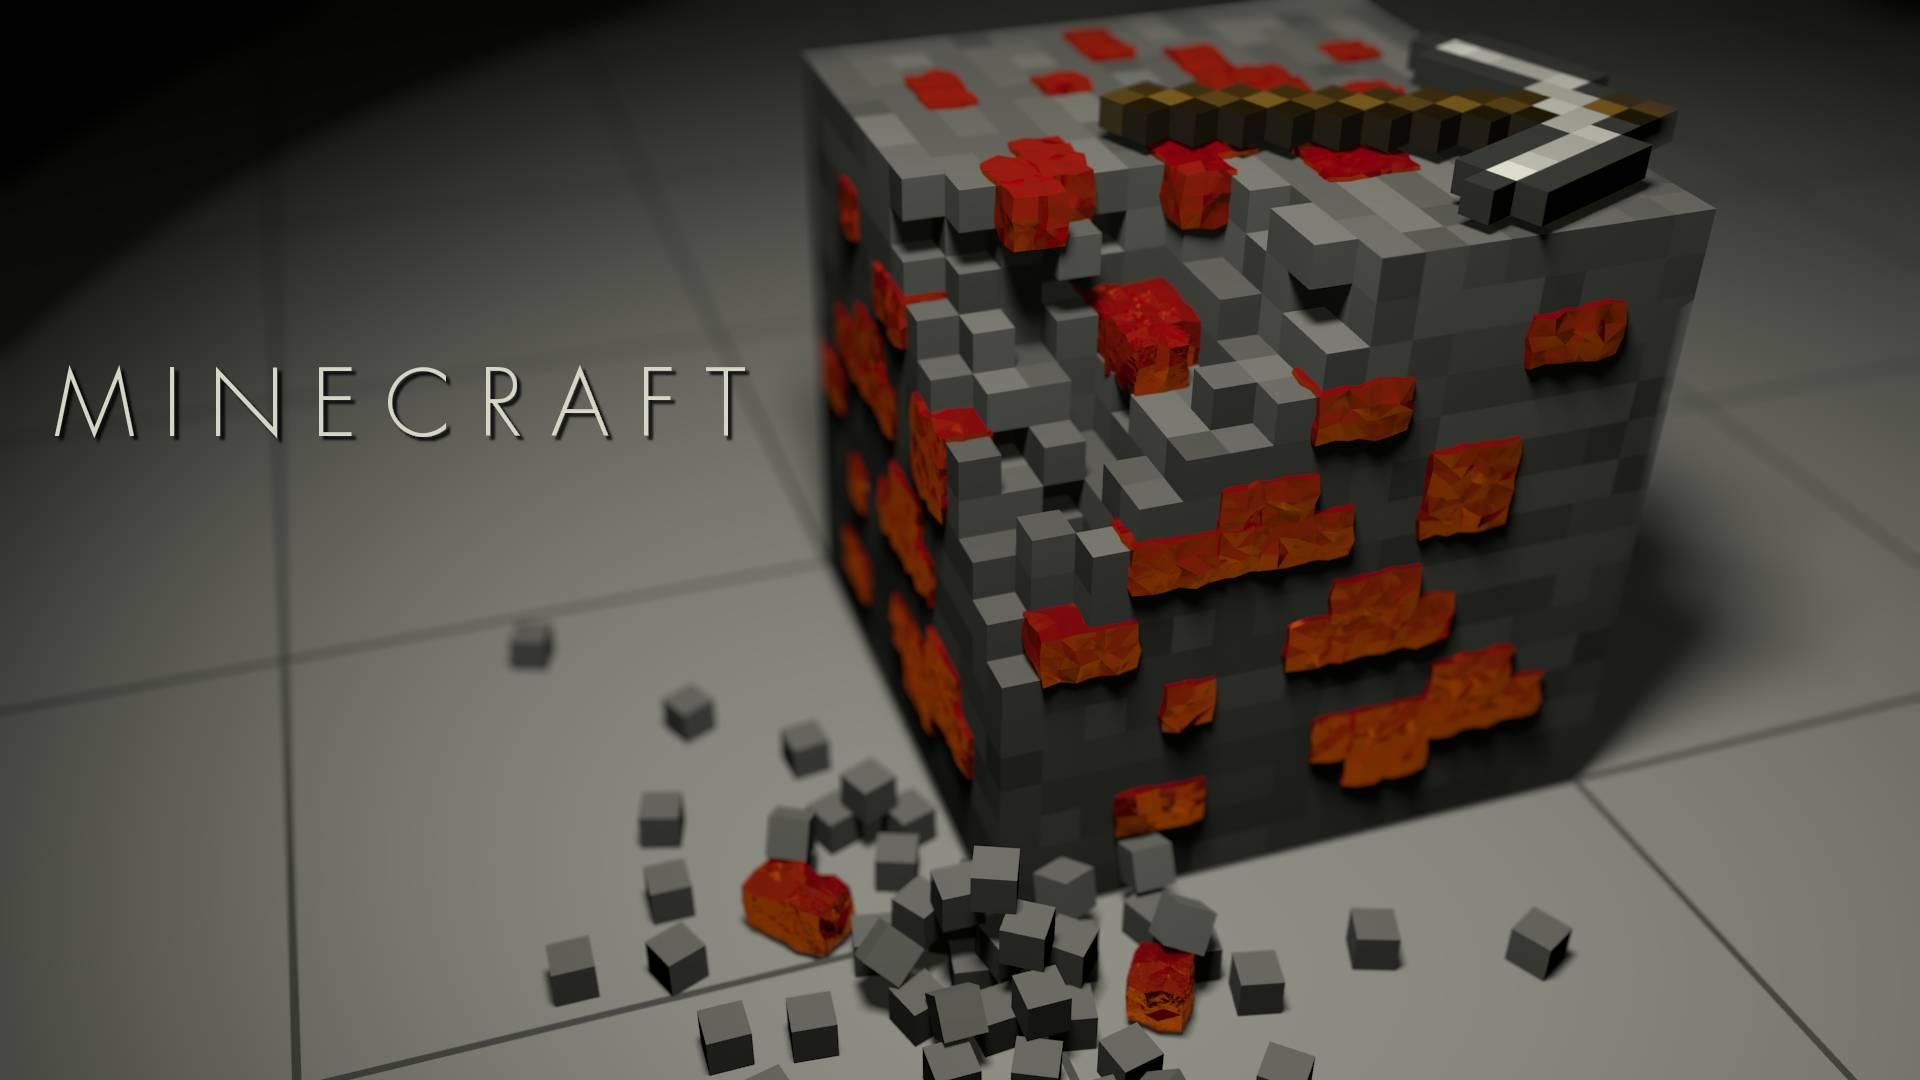 40 Minecraft Redstone Wallpaper On Wallpapersafari